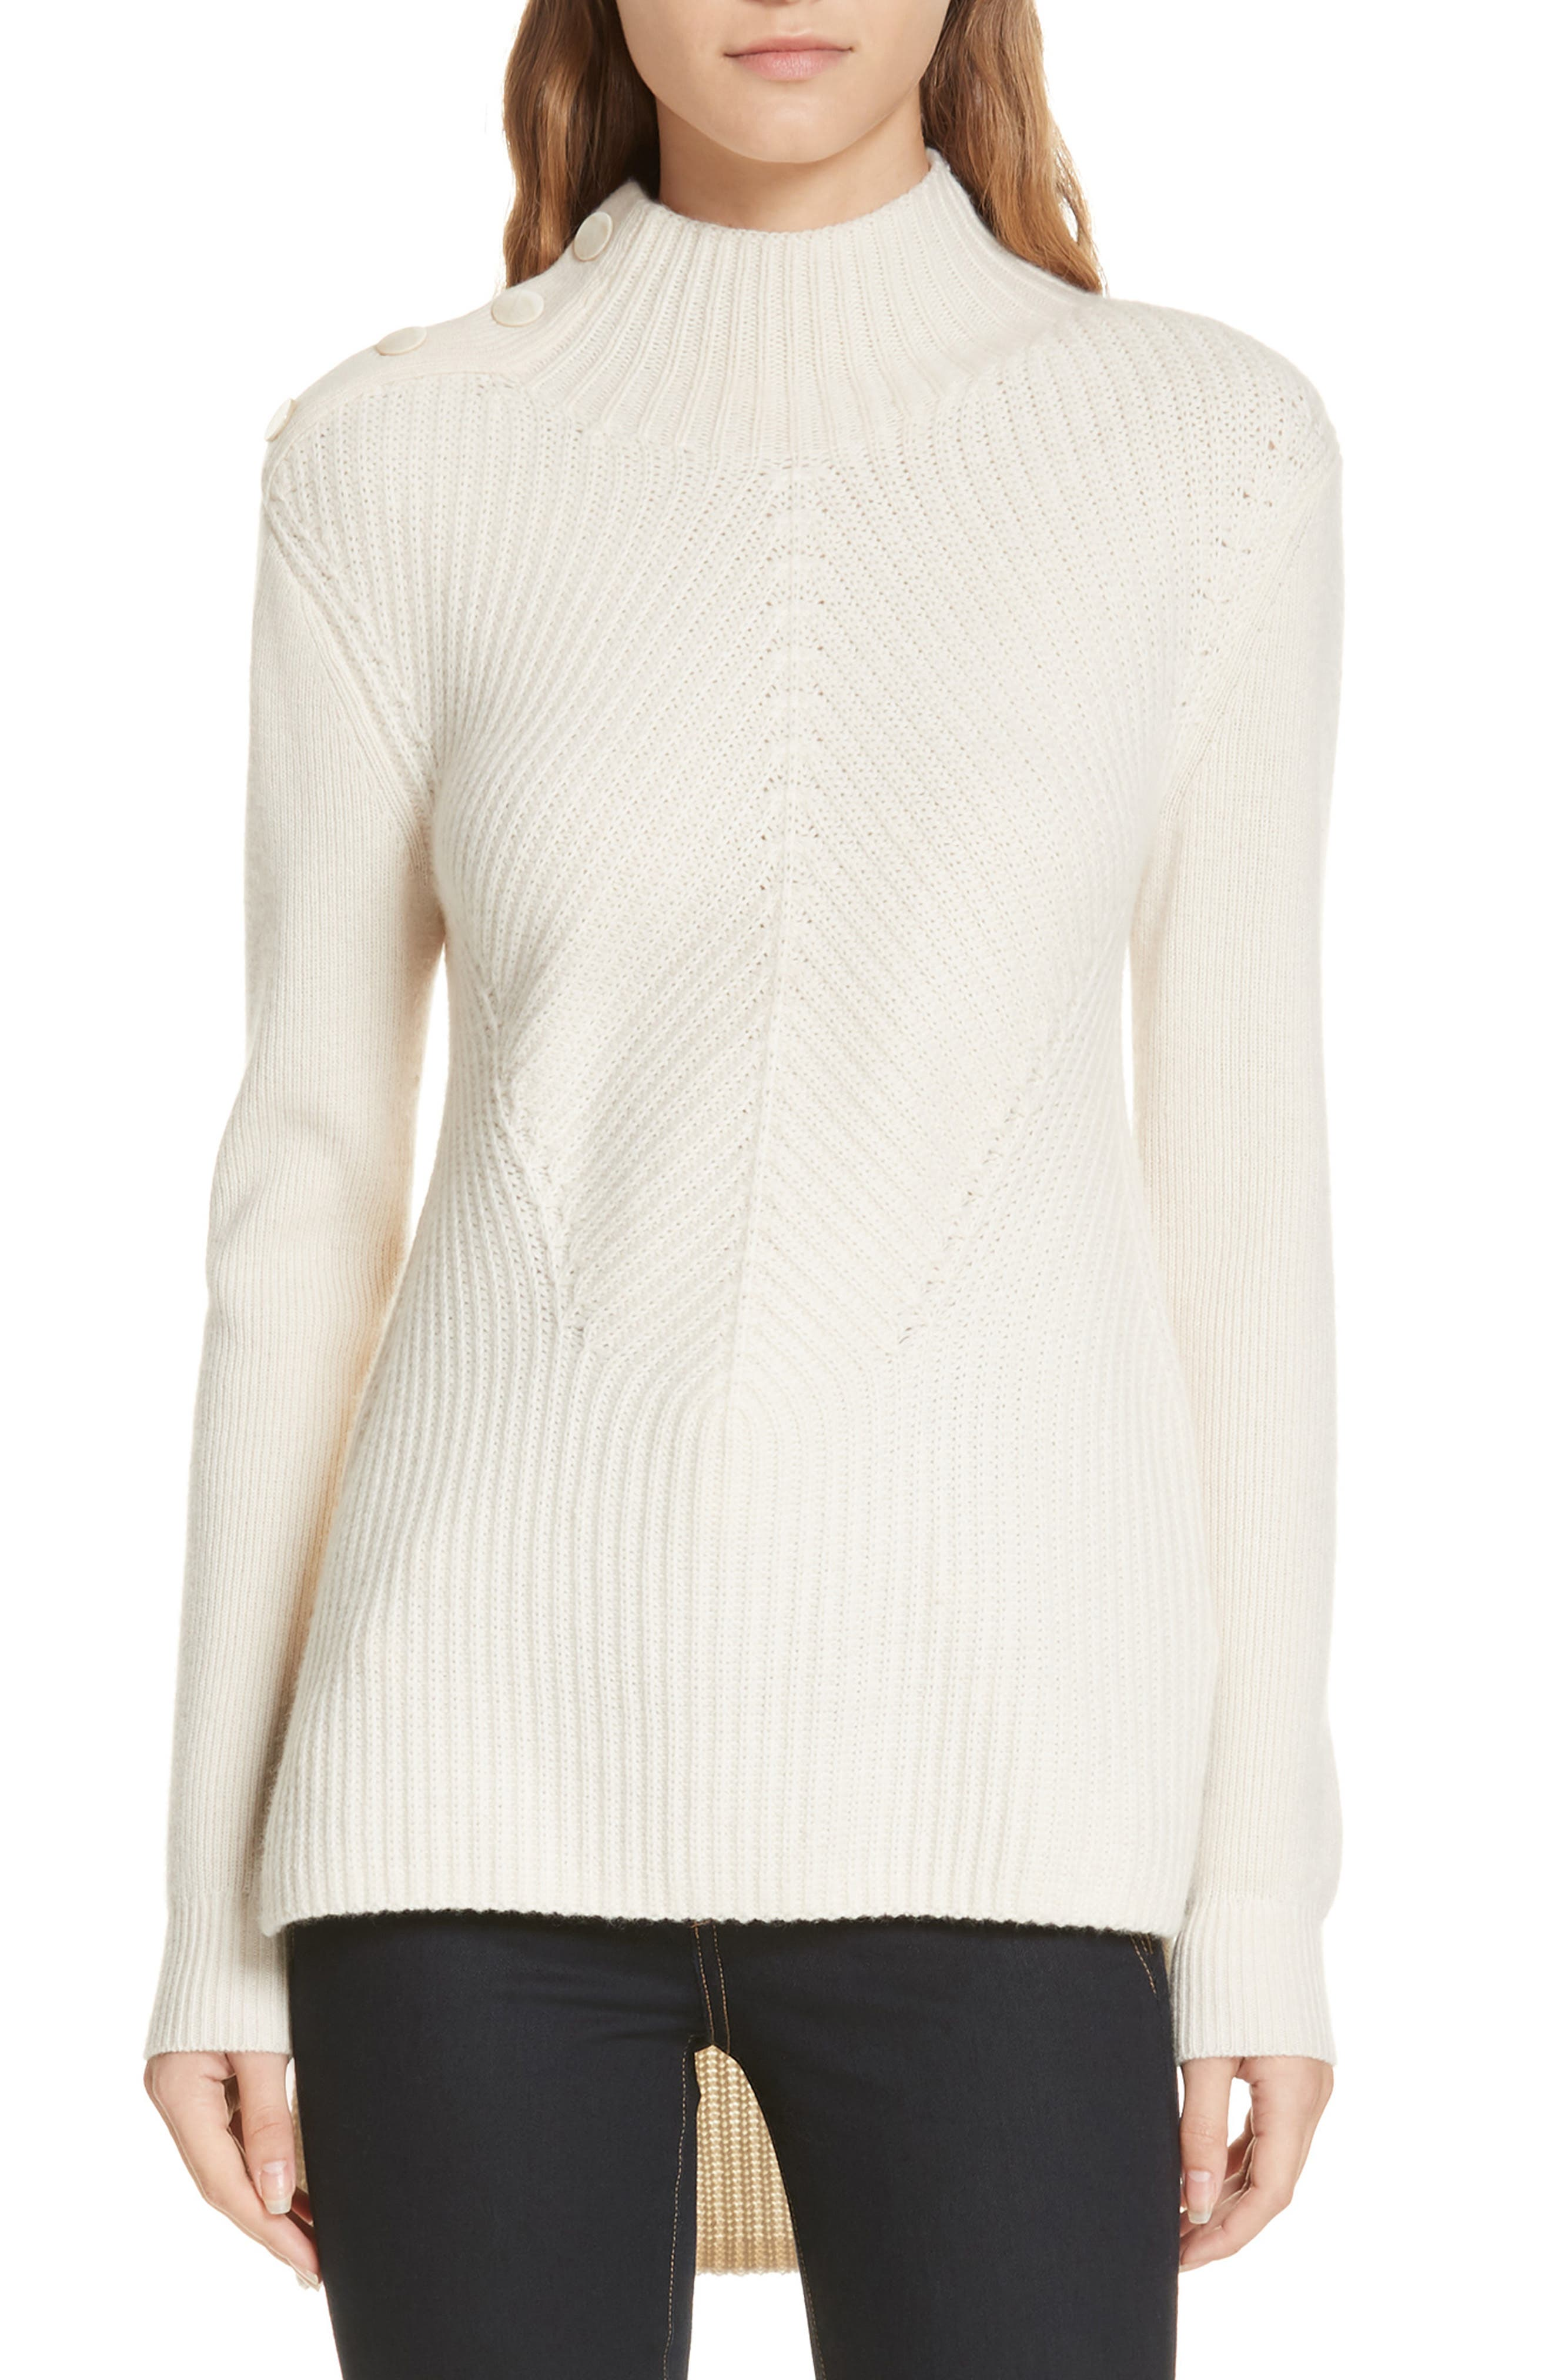 Veronica Beard Rama Merino Wool & Cashmere High/low Sweater, Ivory